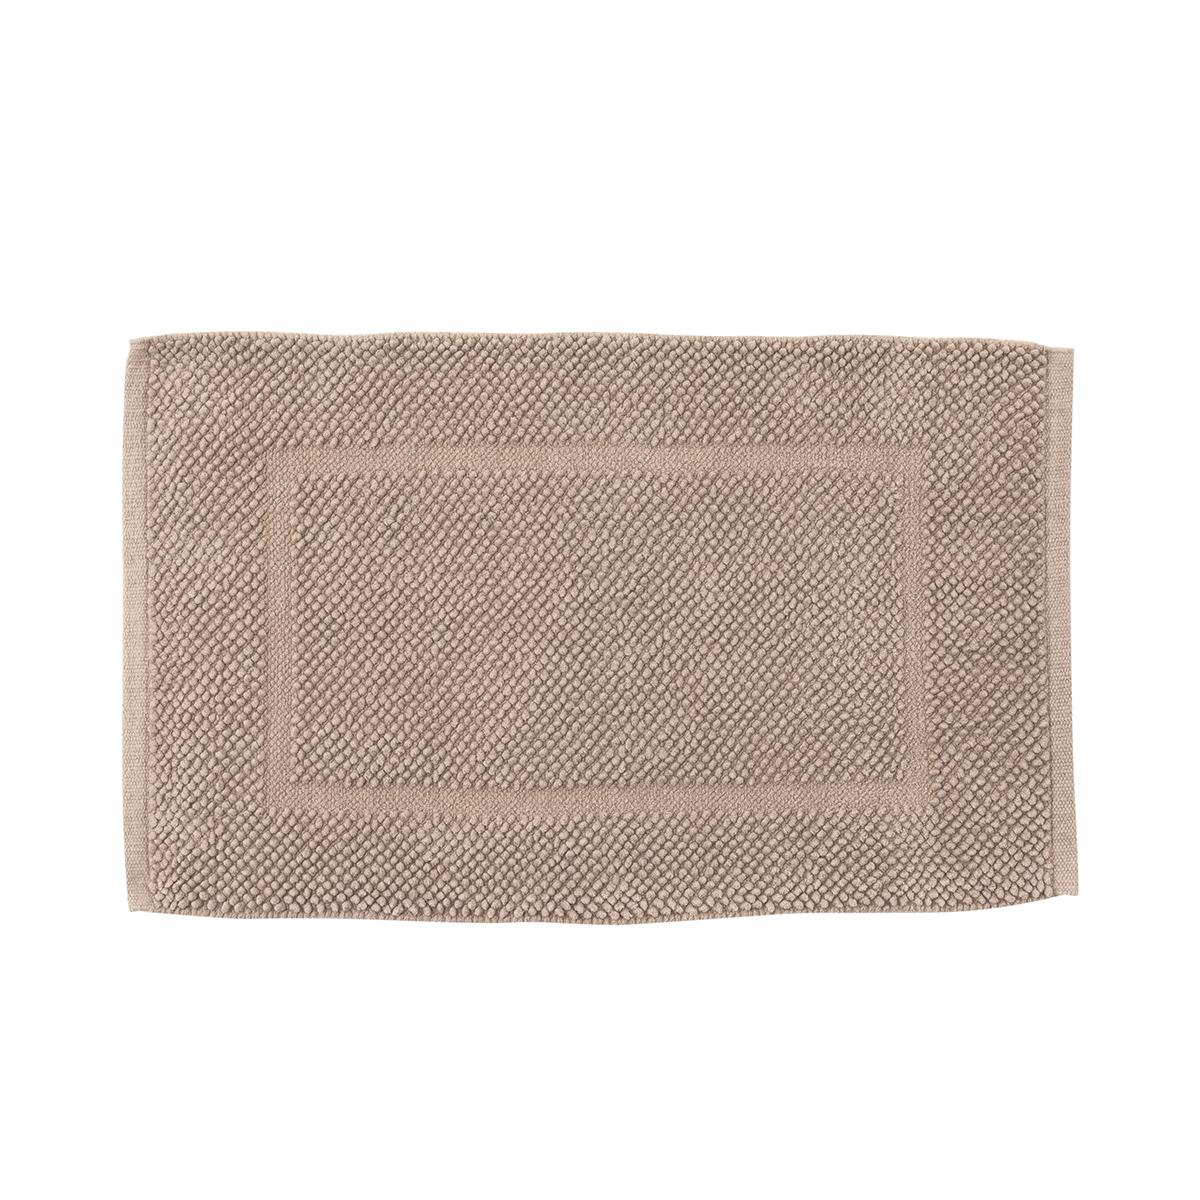 Tappeto bagno in spugna 50x80 cm SOLO TUO Zucchi - var. corda | eBay